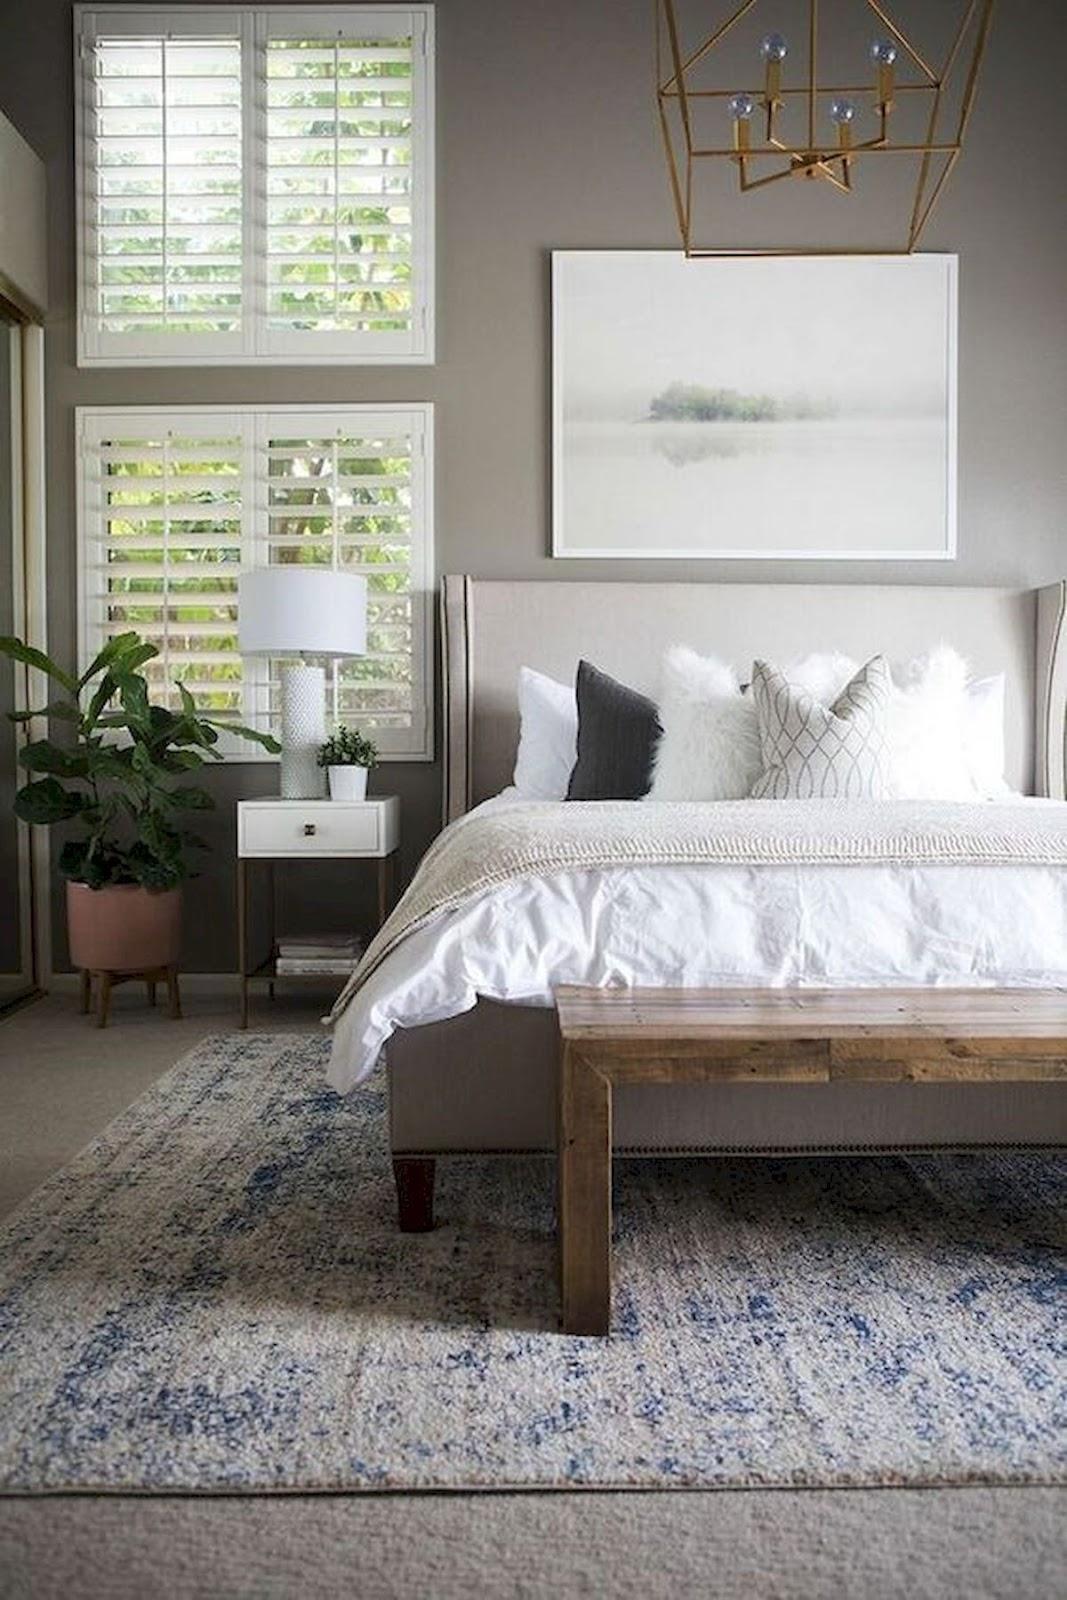 trendy bedroom interior design idea